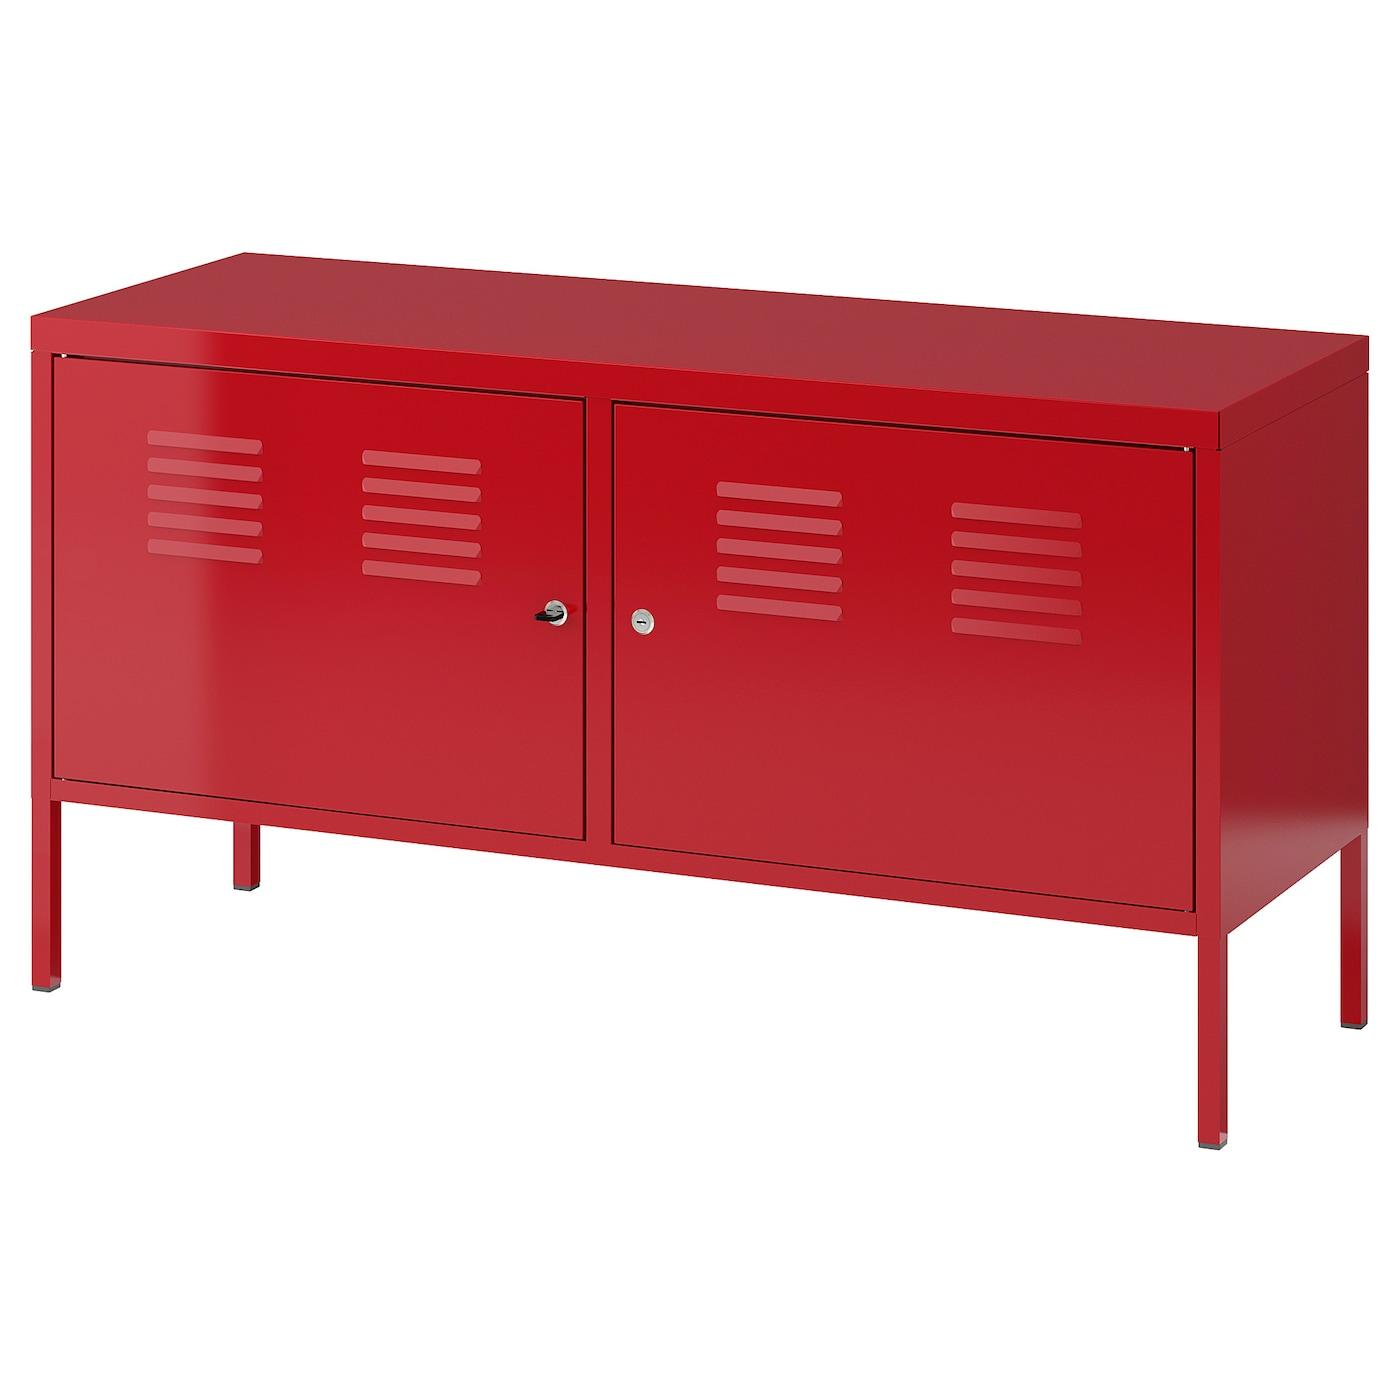 Ikea Ps Armoire Metallique Rouge 119x63 Cm Ikea